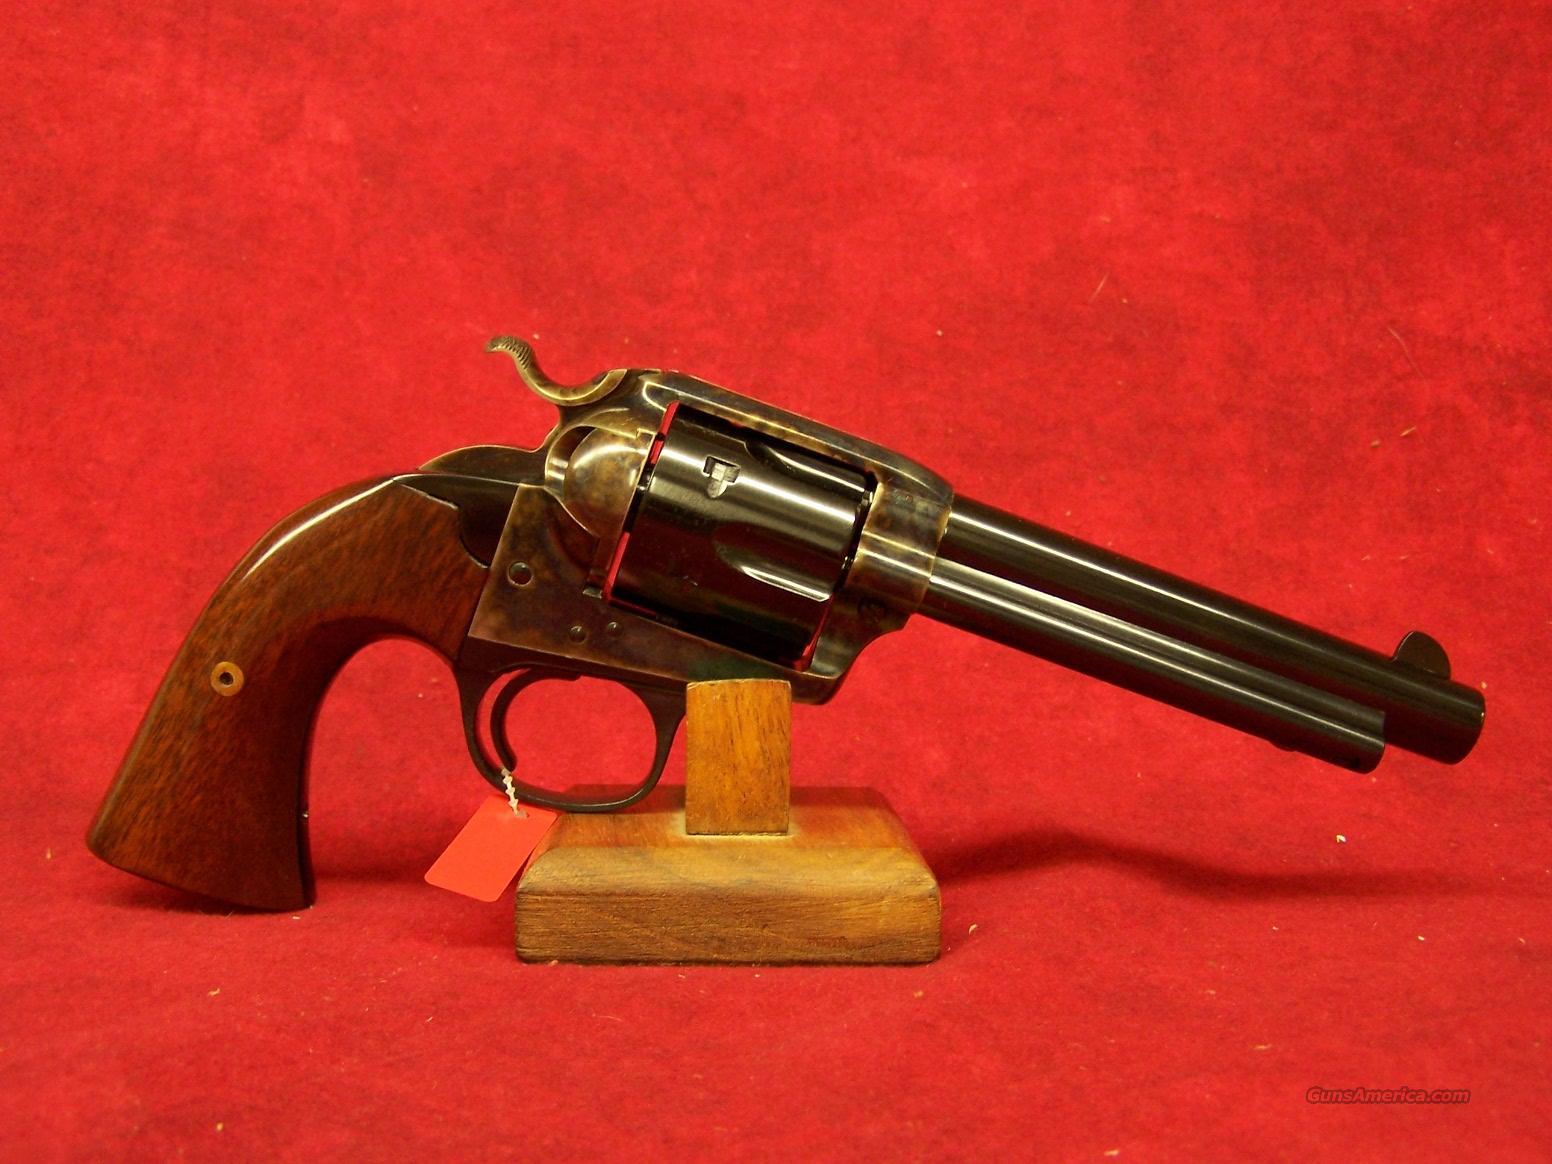 "Uberti 1873 Cattleman Bisley NM Steel .357 Mag 5 1/2"" (346030)  Guns > Pistols > Uberti Pistols > Ctg."